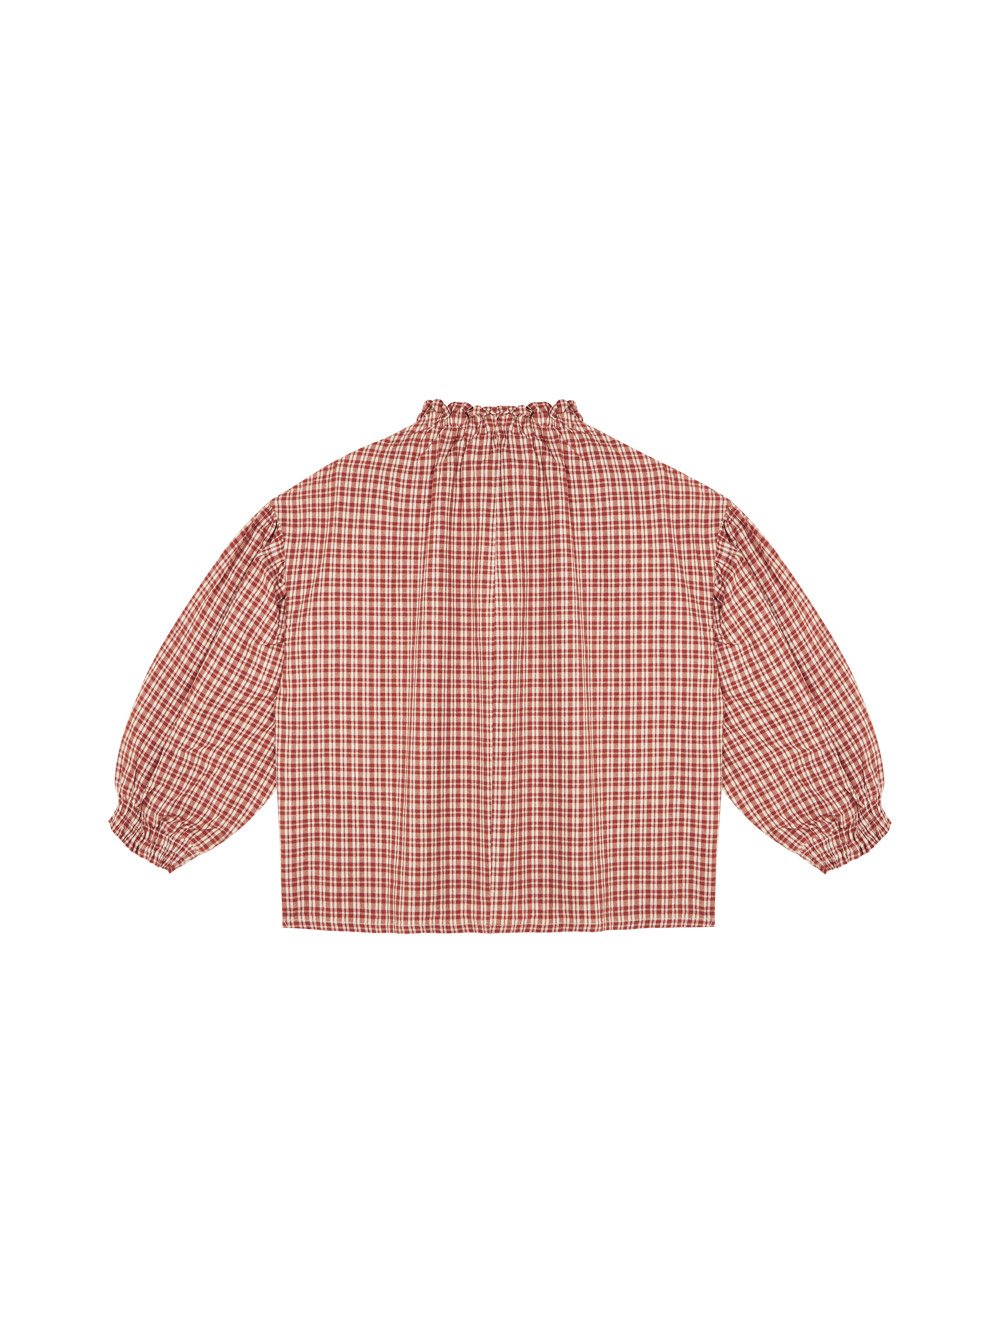 Olivia blouse - Caramel Check-2